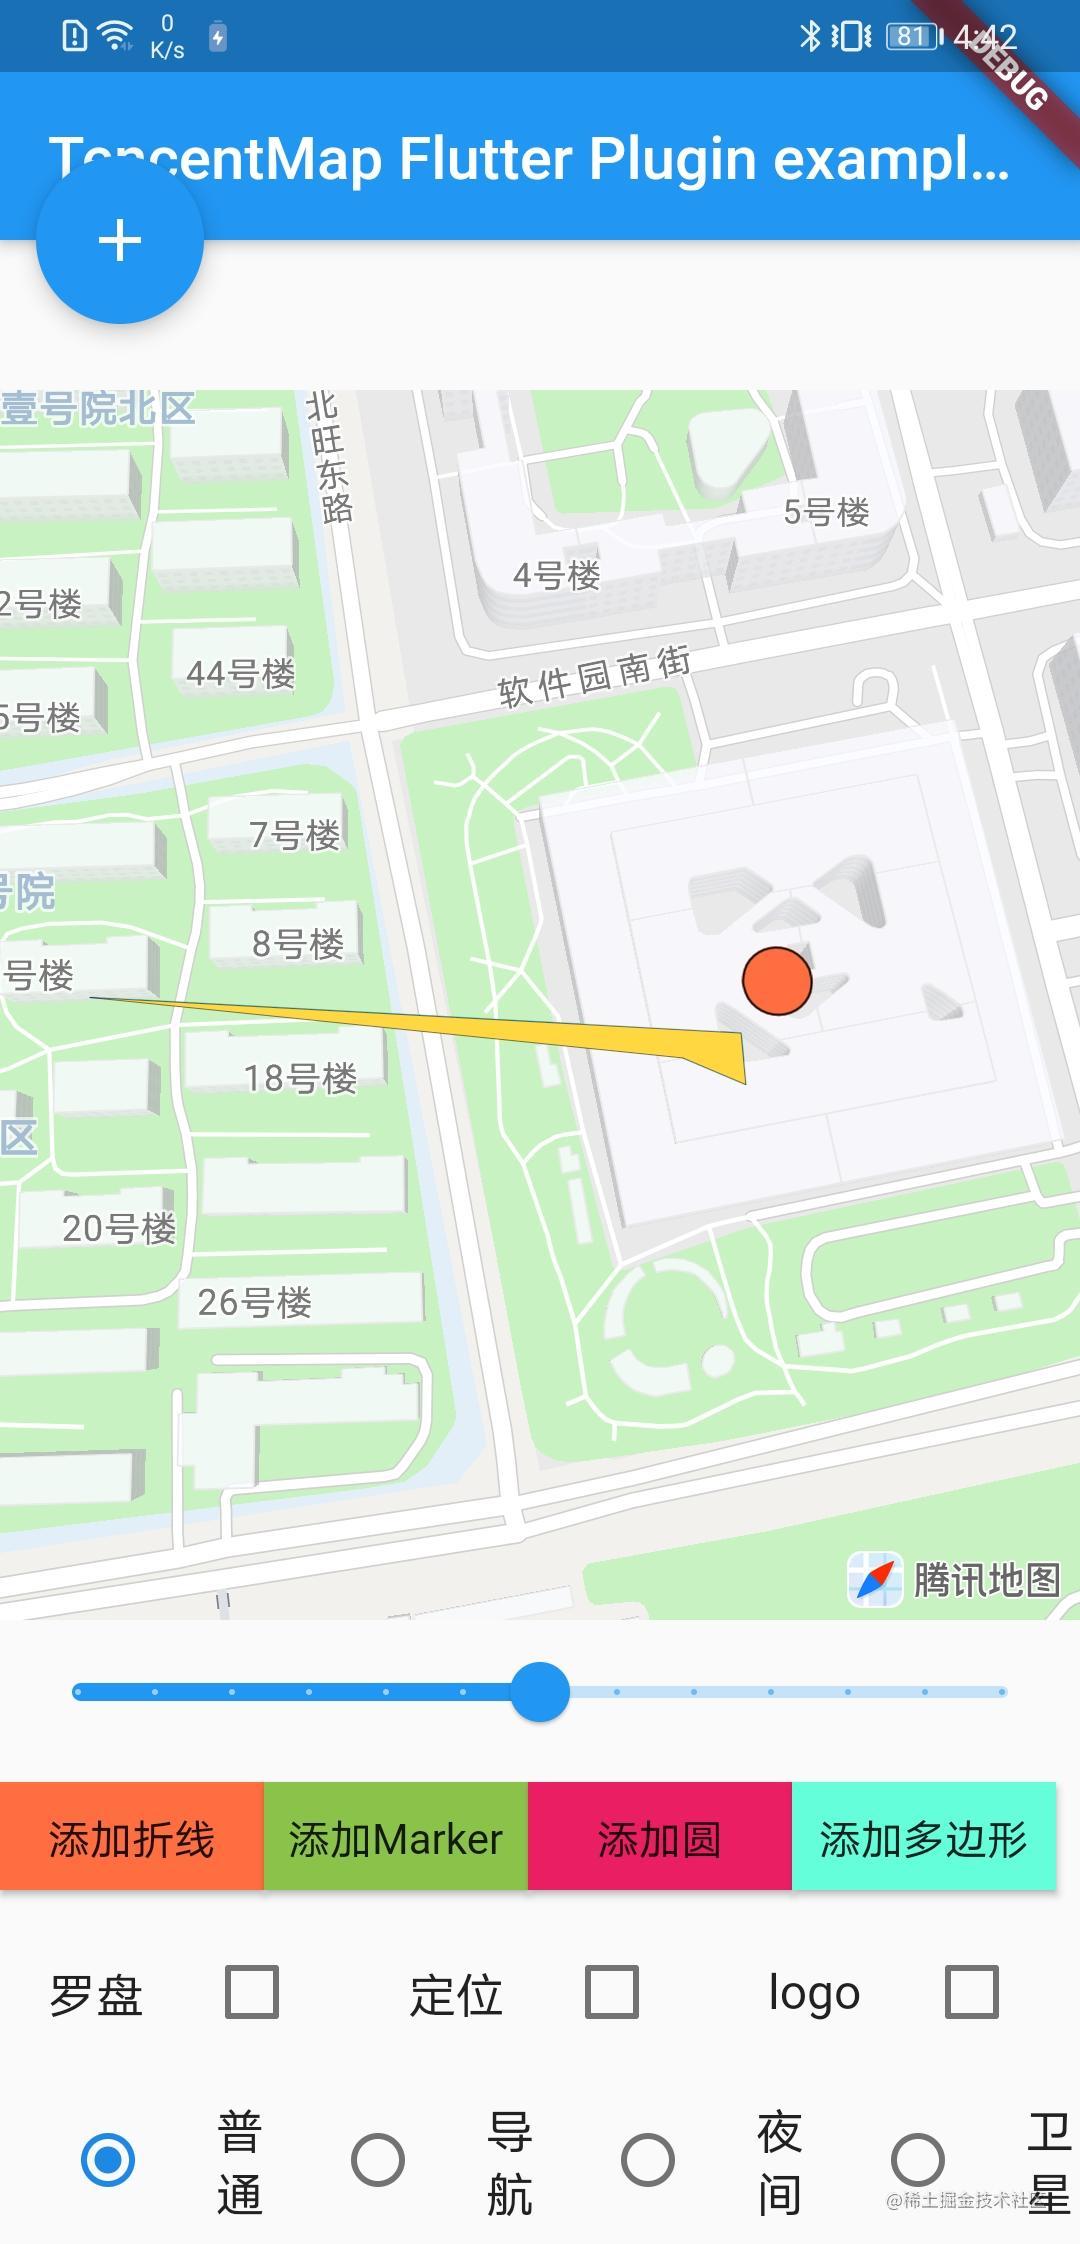 Screenshot_20210324_164237_com.tencent.tencentmap_example.jpg